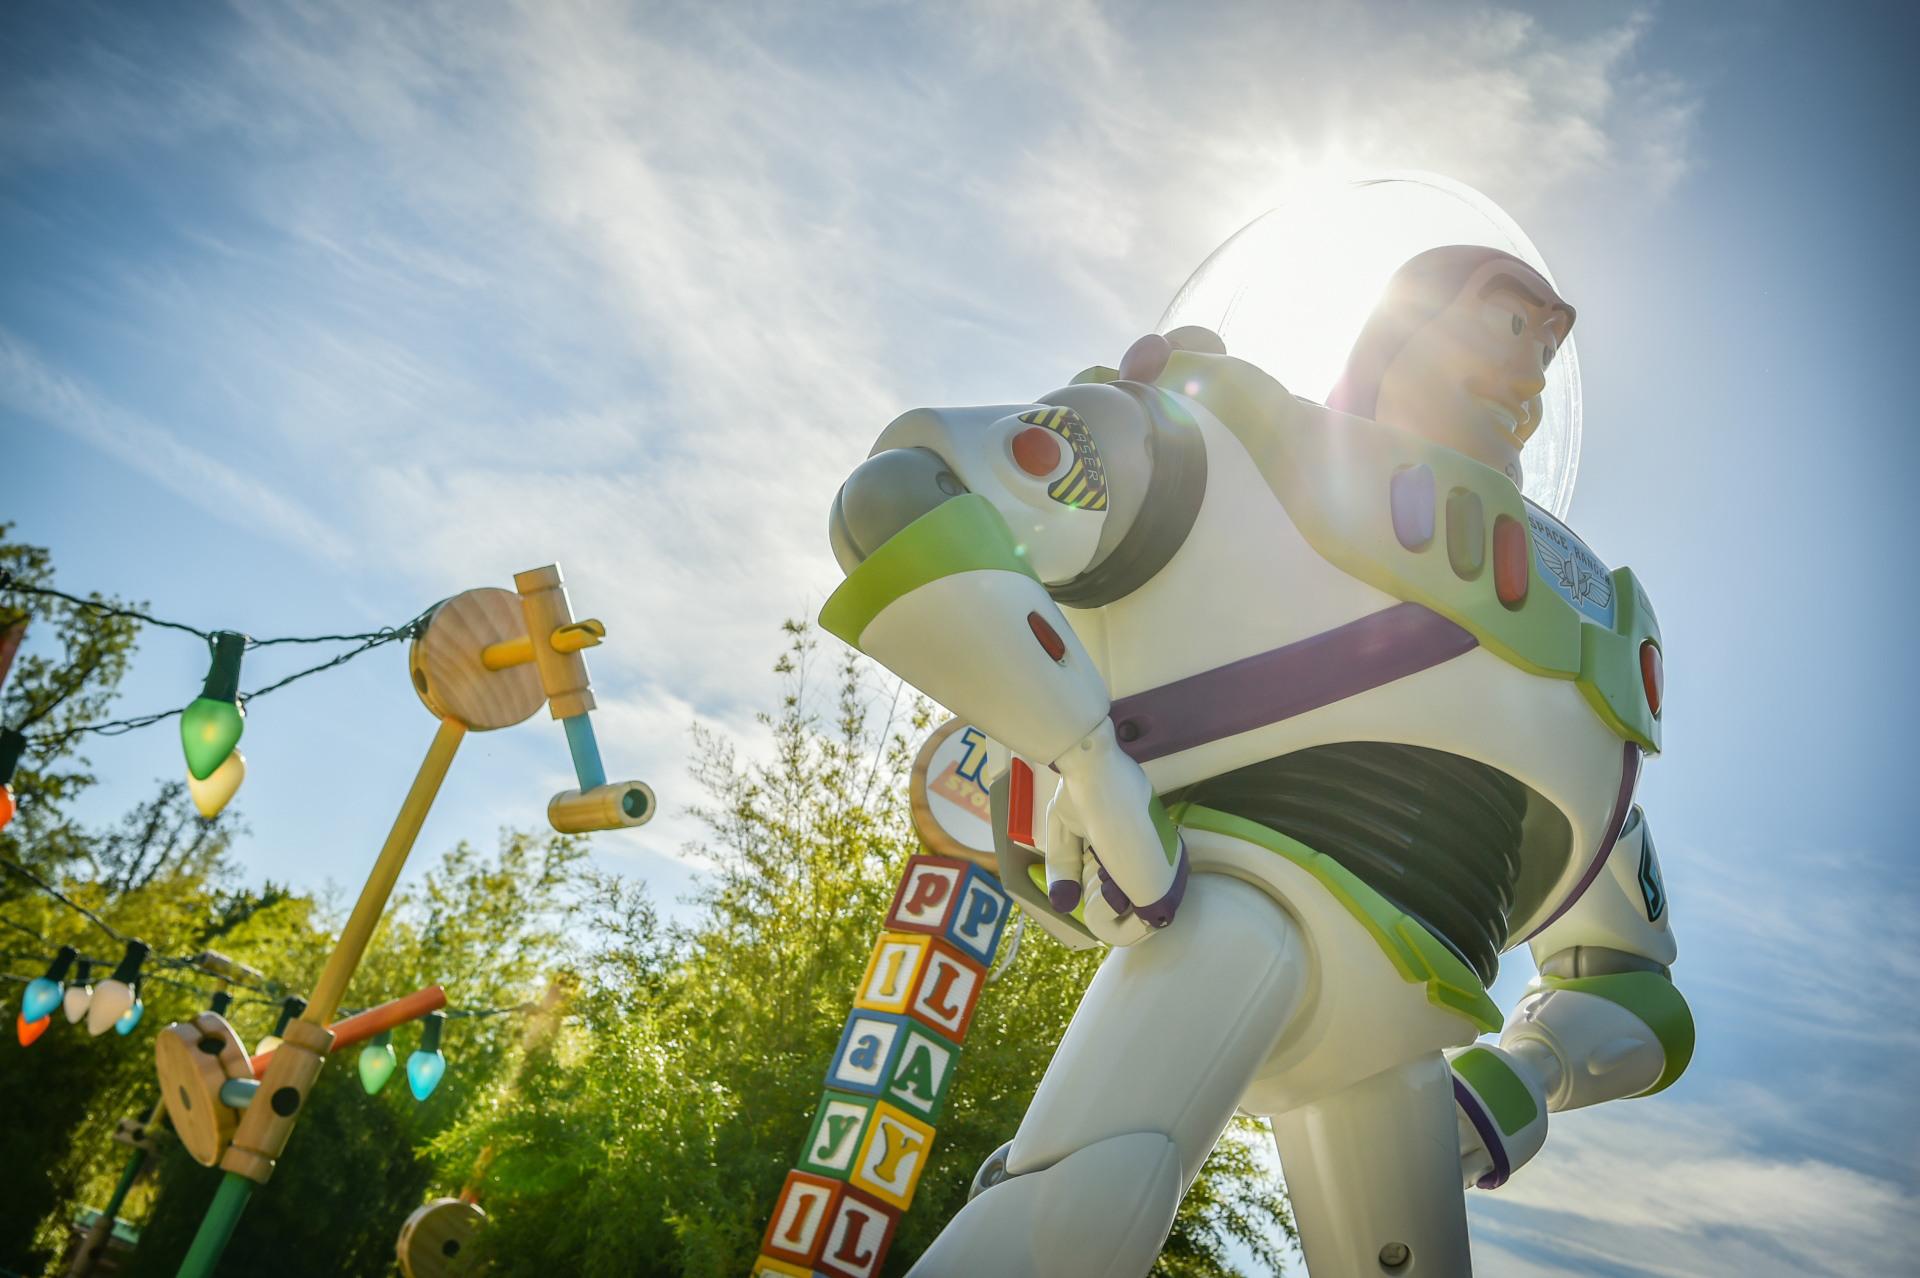 2021 - World of Pixar 1m5yqq10